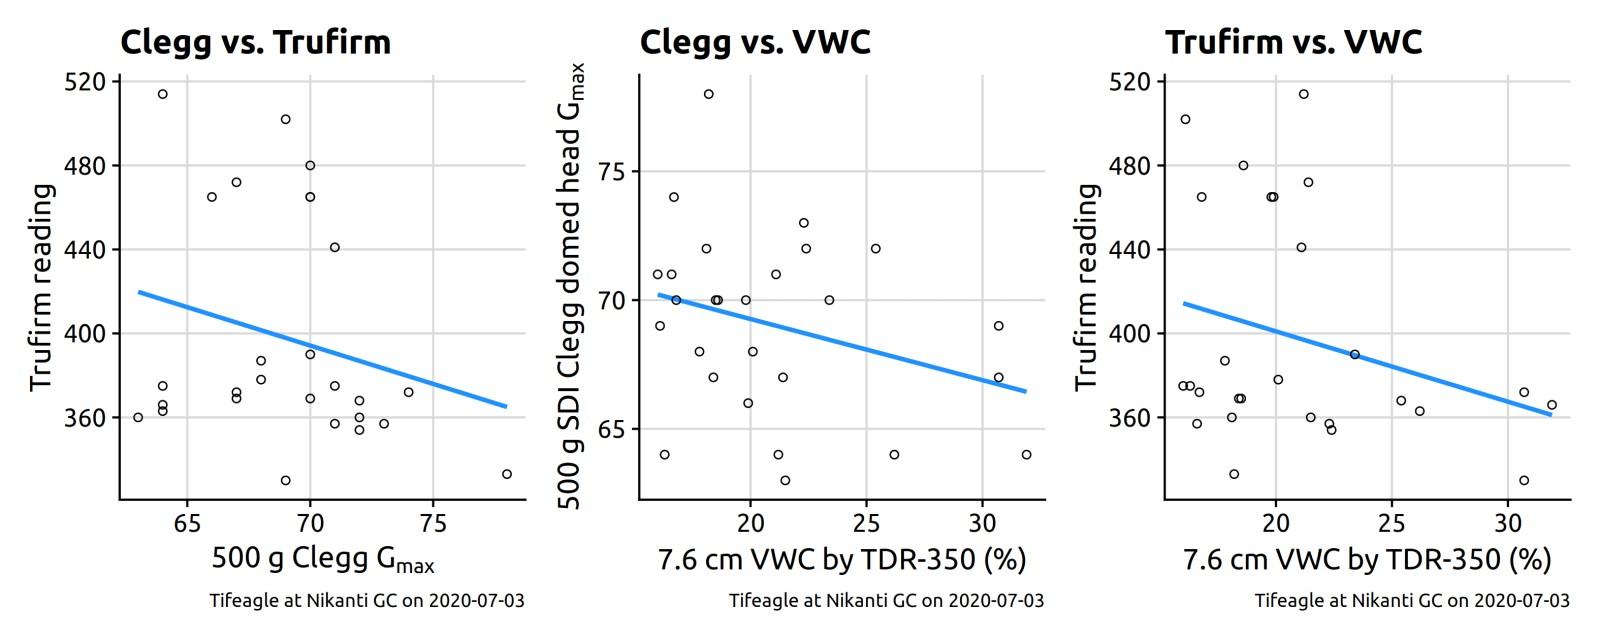 3 charts of clegg vs trufirm vs vwc